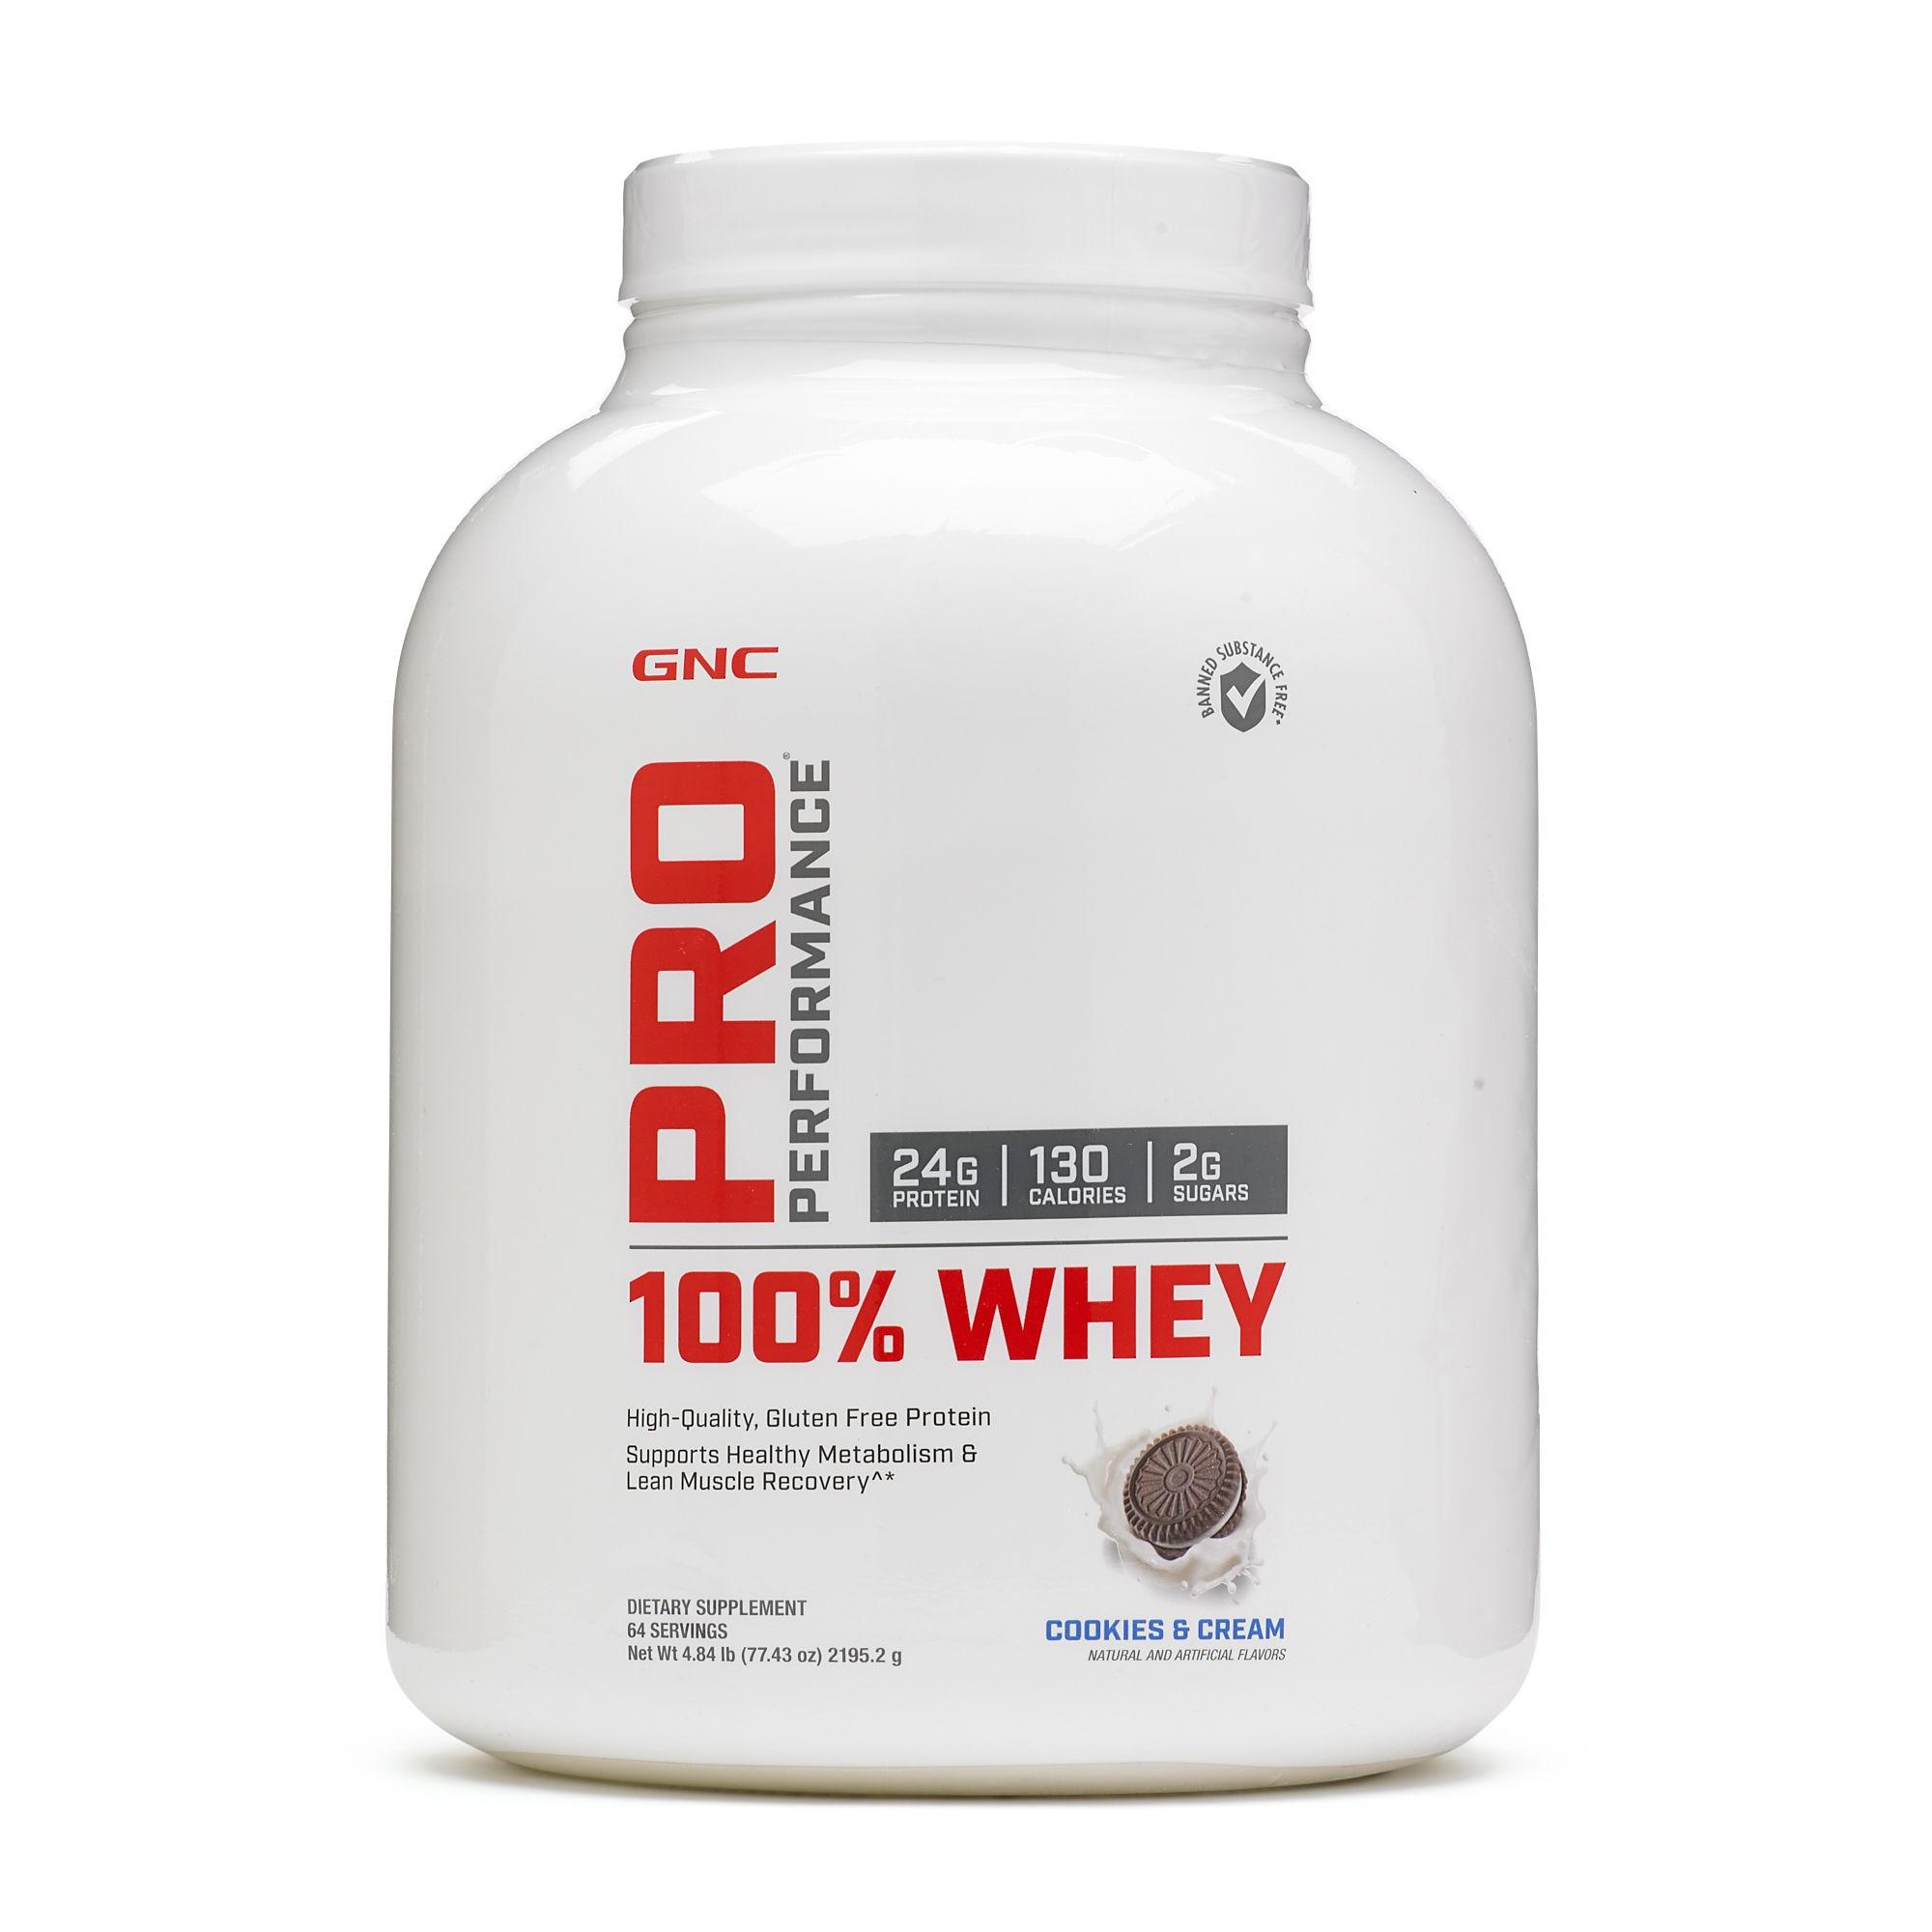 GNC Pro Performance® 100% Whey, Proteina din Zer, cu Aroma de Biscuiti si Crema, 2195.2g